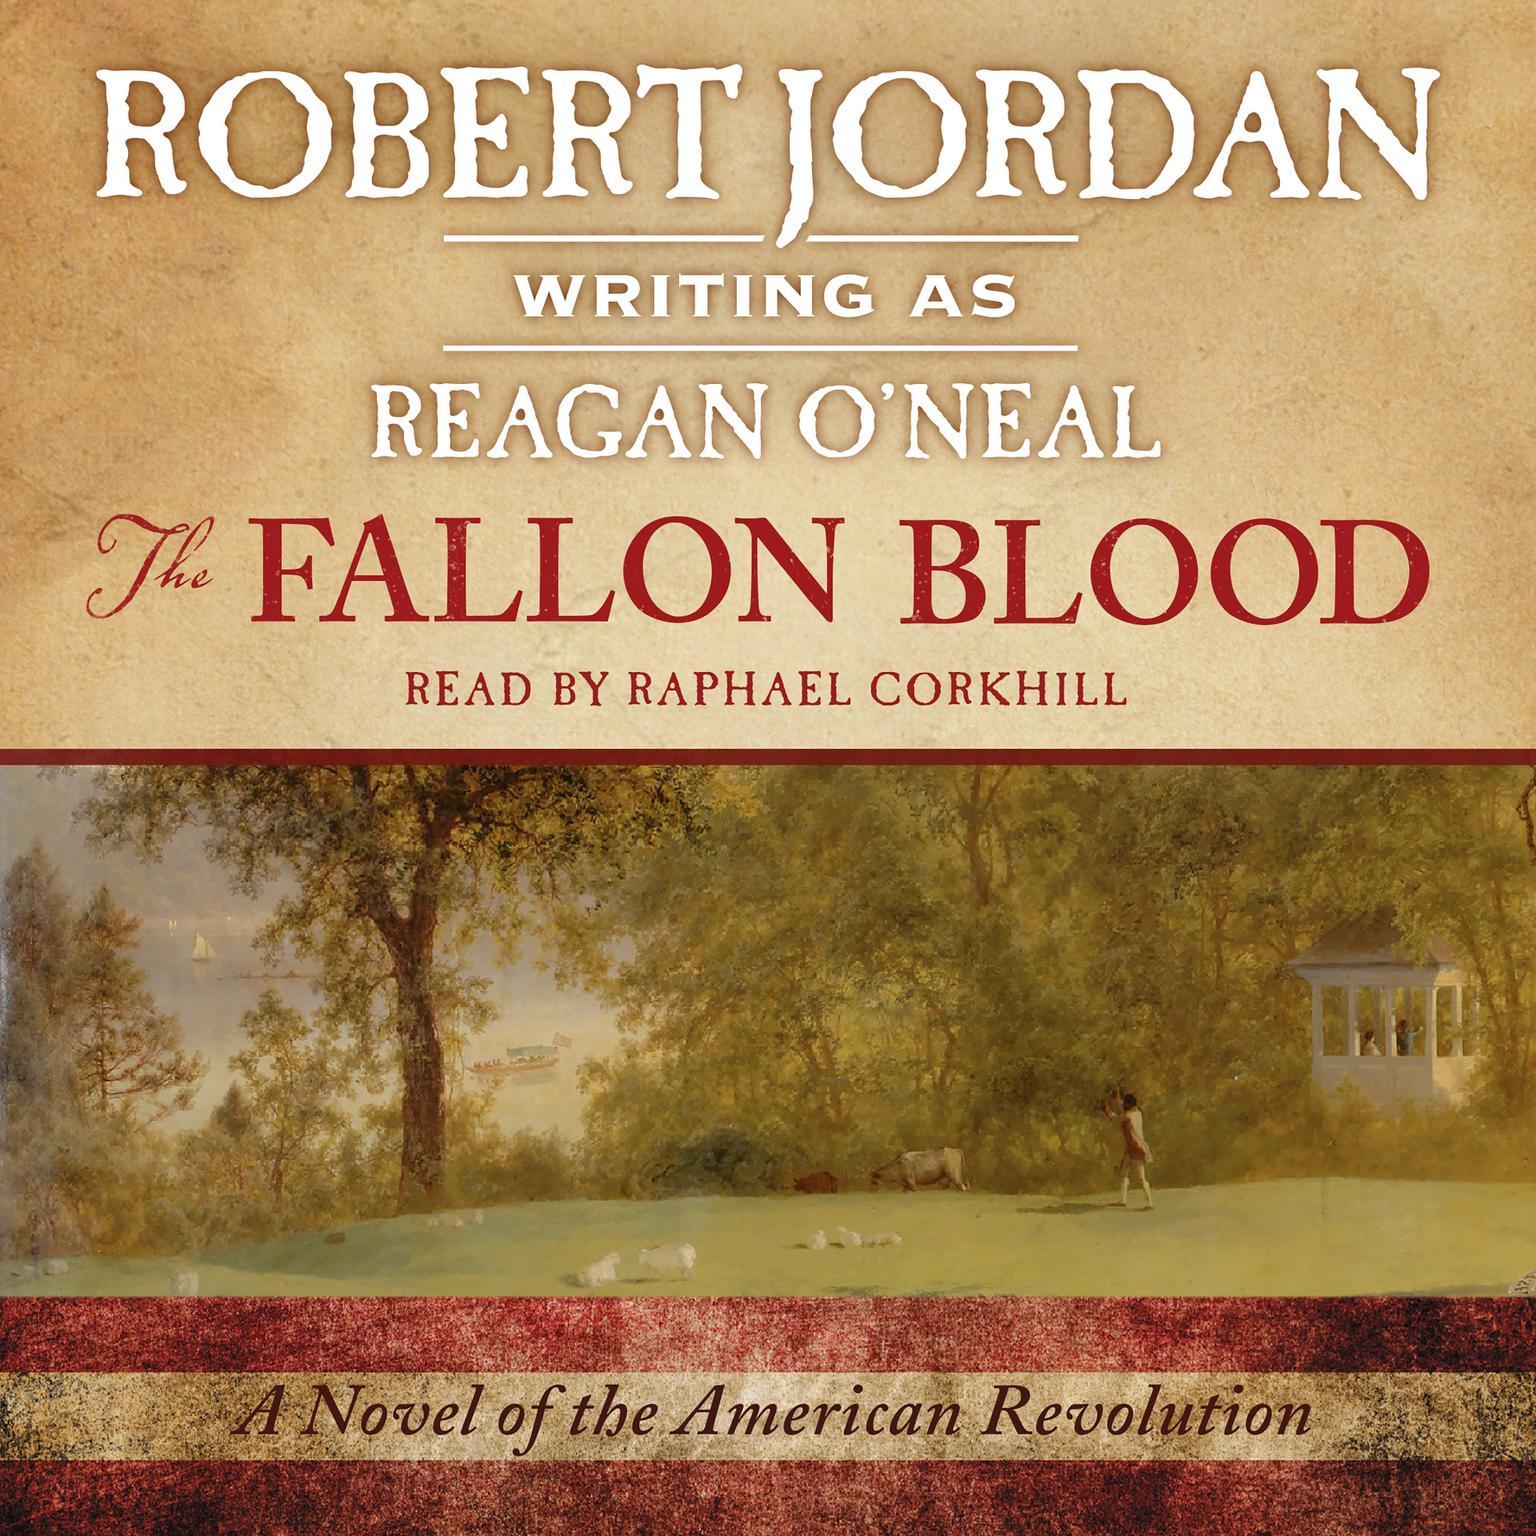 The Fallon Blood: A Novel of the American Revolution Audiobook, by Robert Jordan